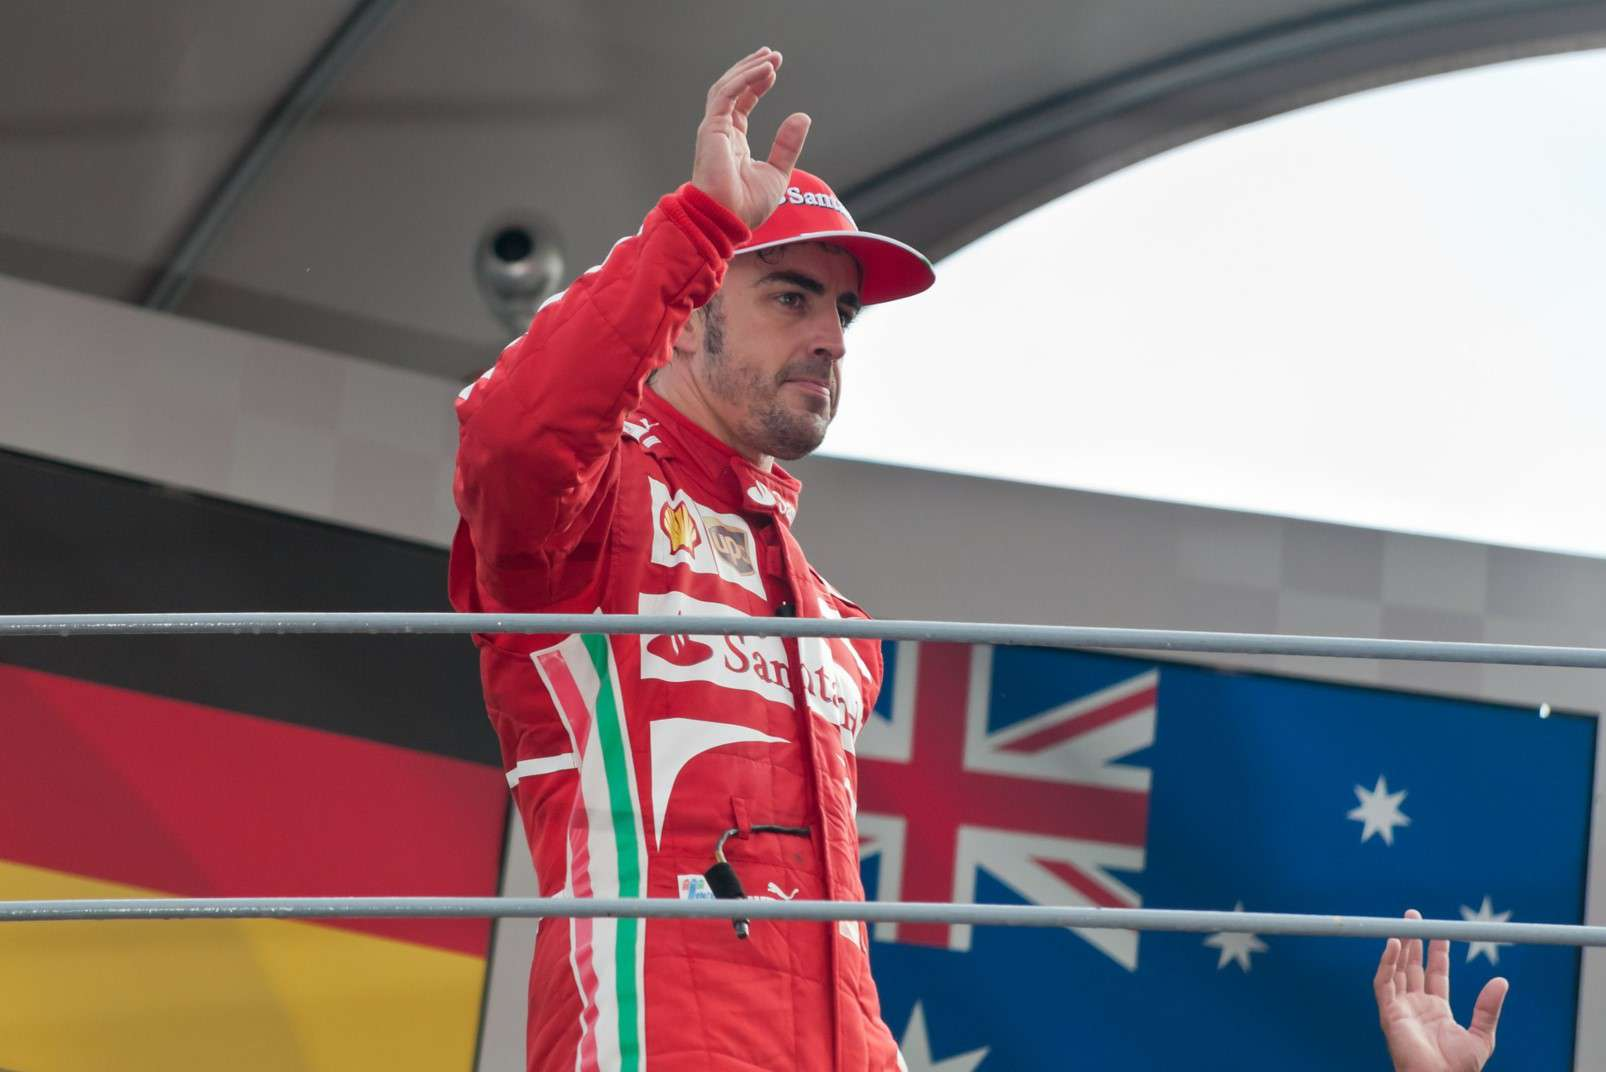 Fernando Alonso at Monza, 2015